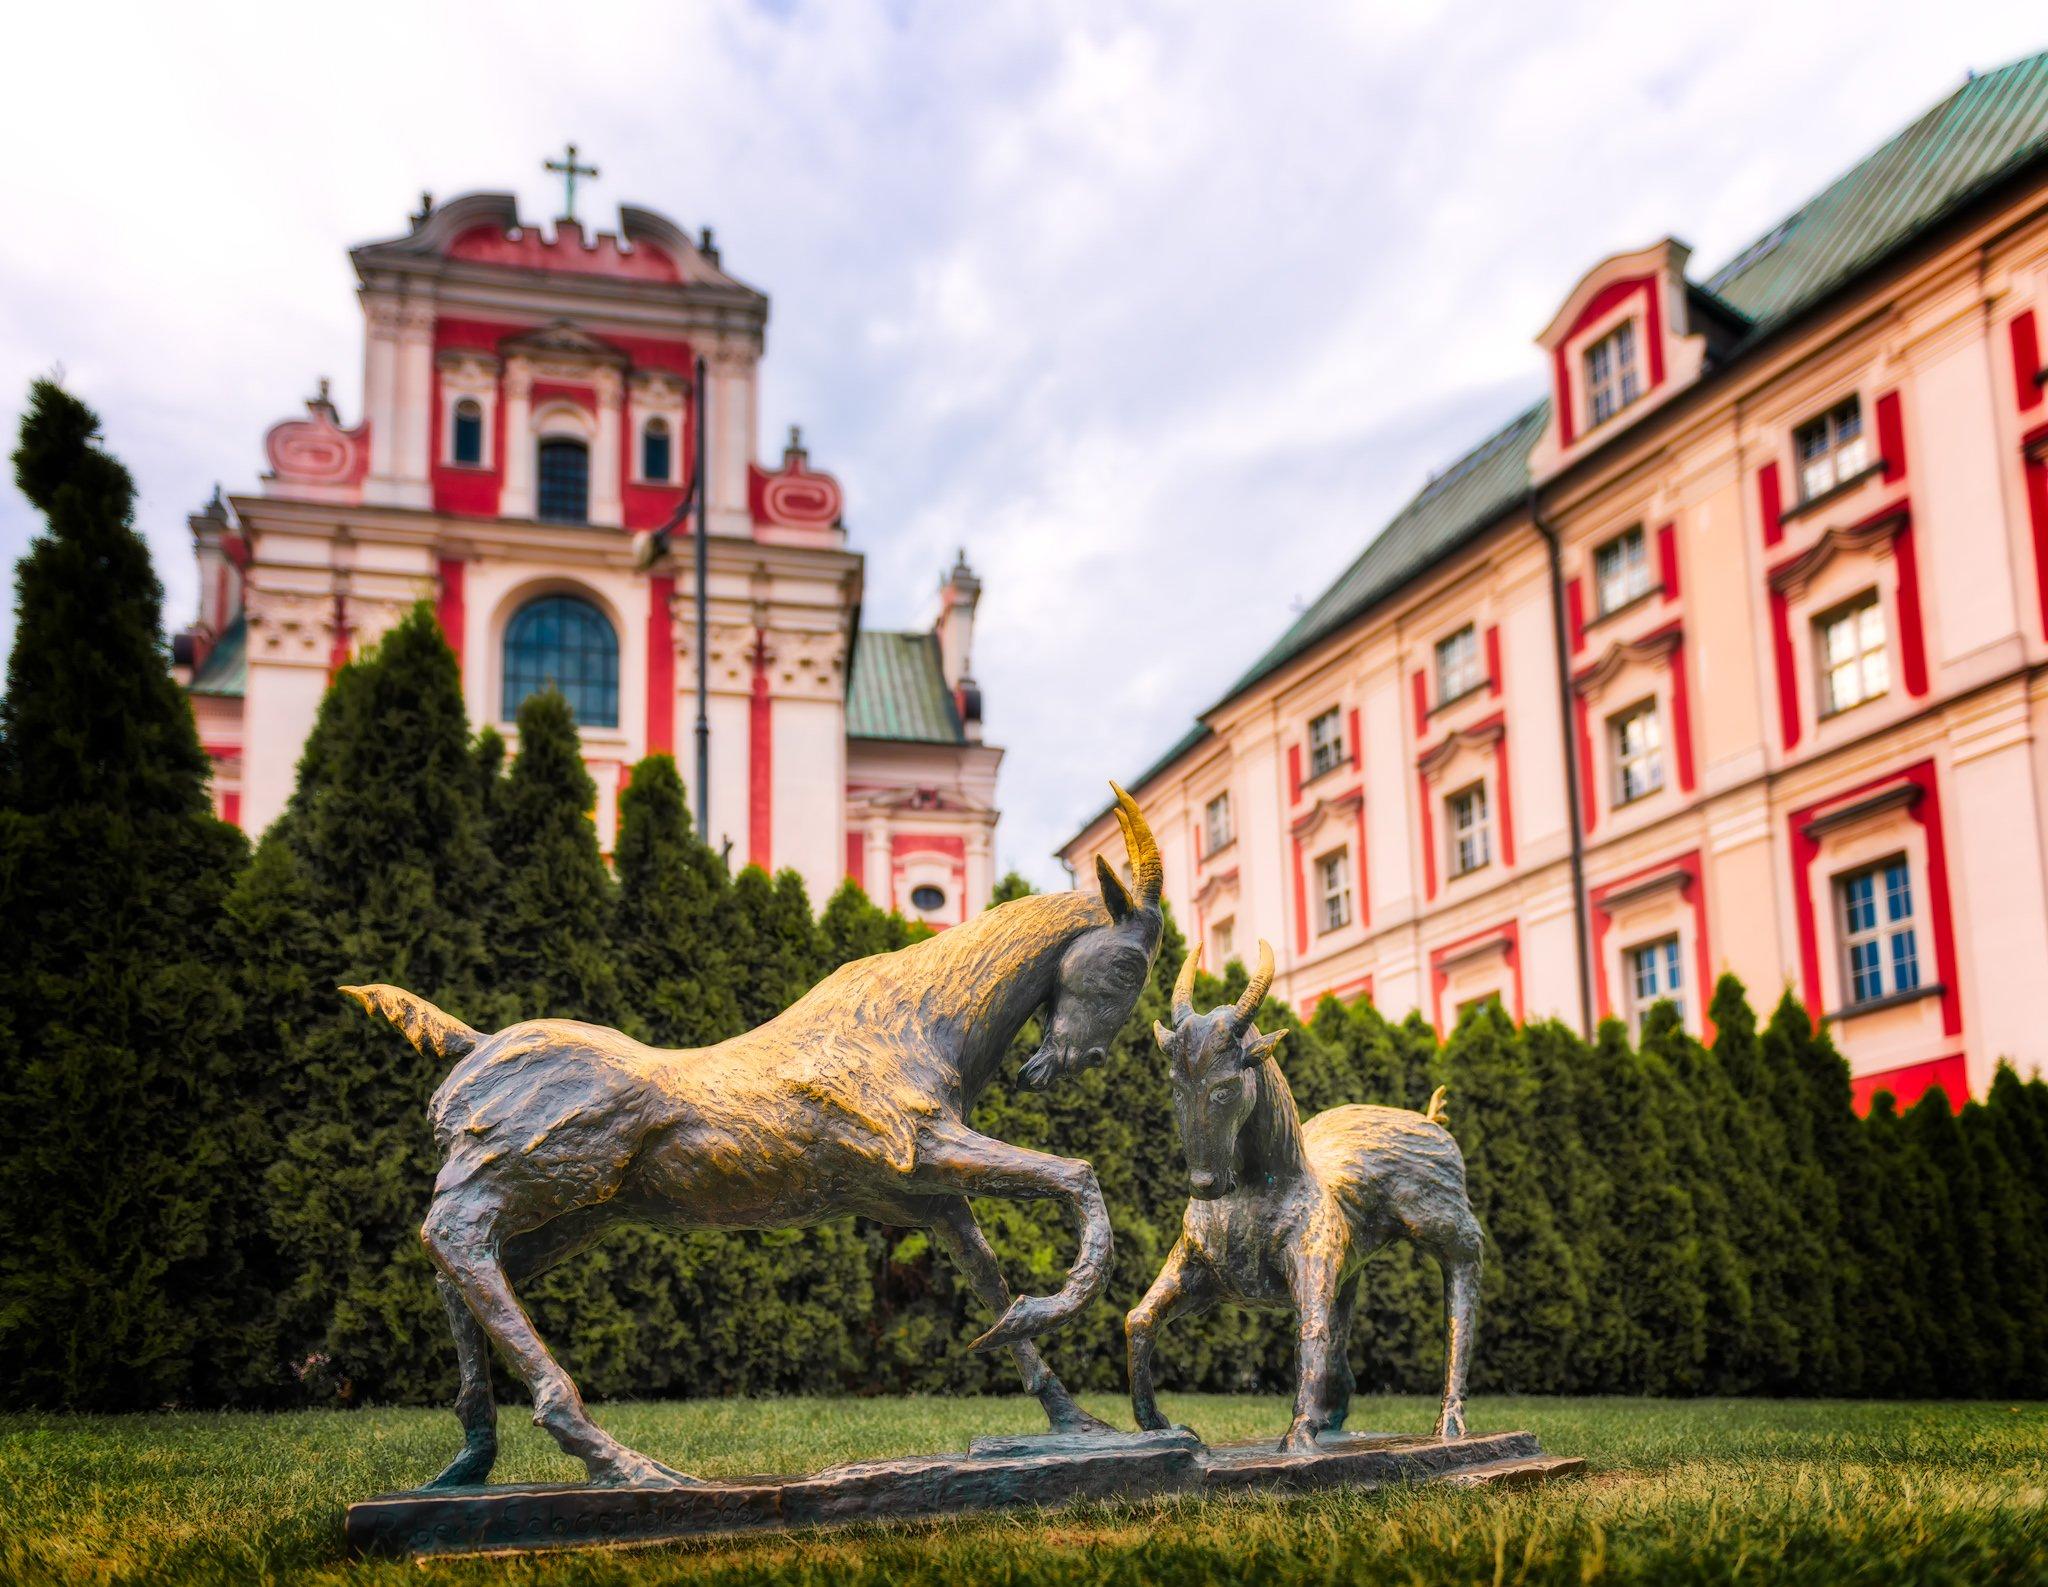 Goats - symbol of Poznan; Poland